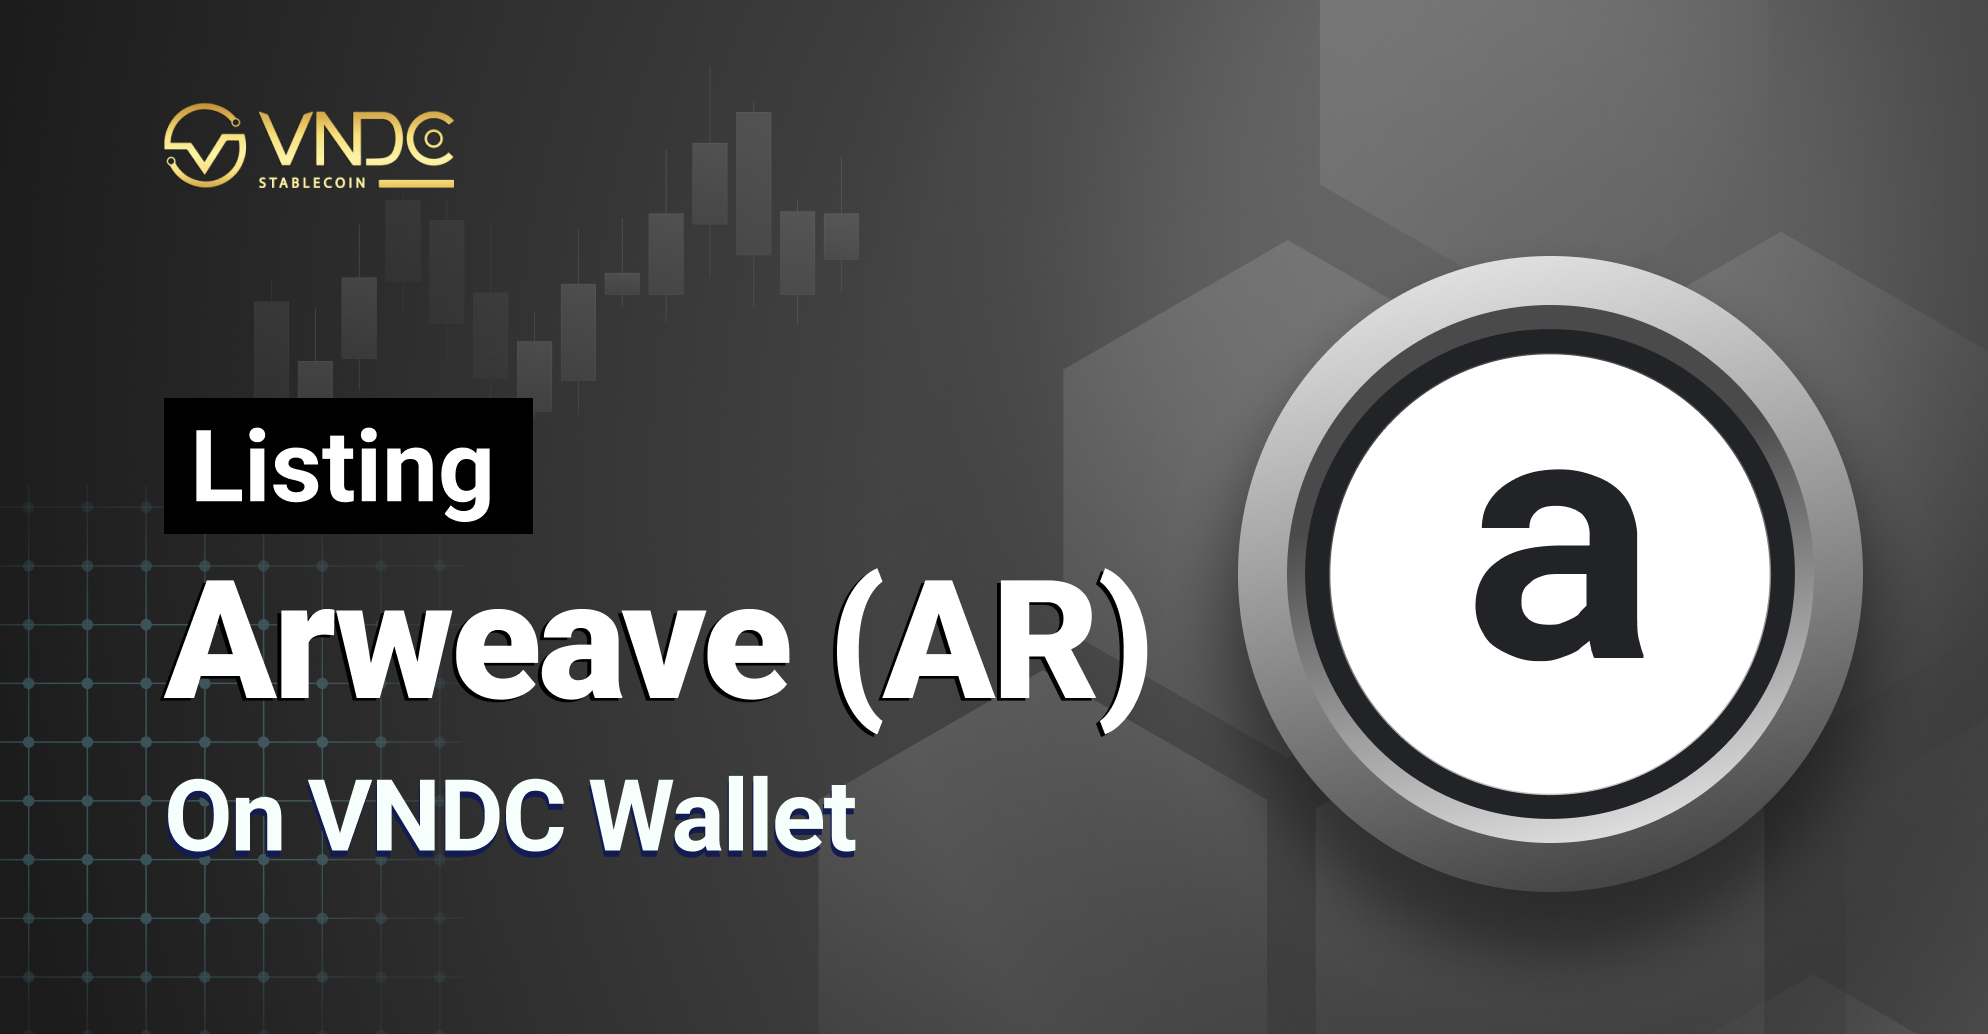 Listing Arweave (AR) on VNDC Wallet